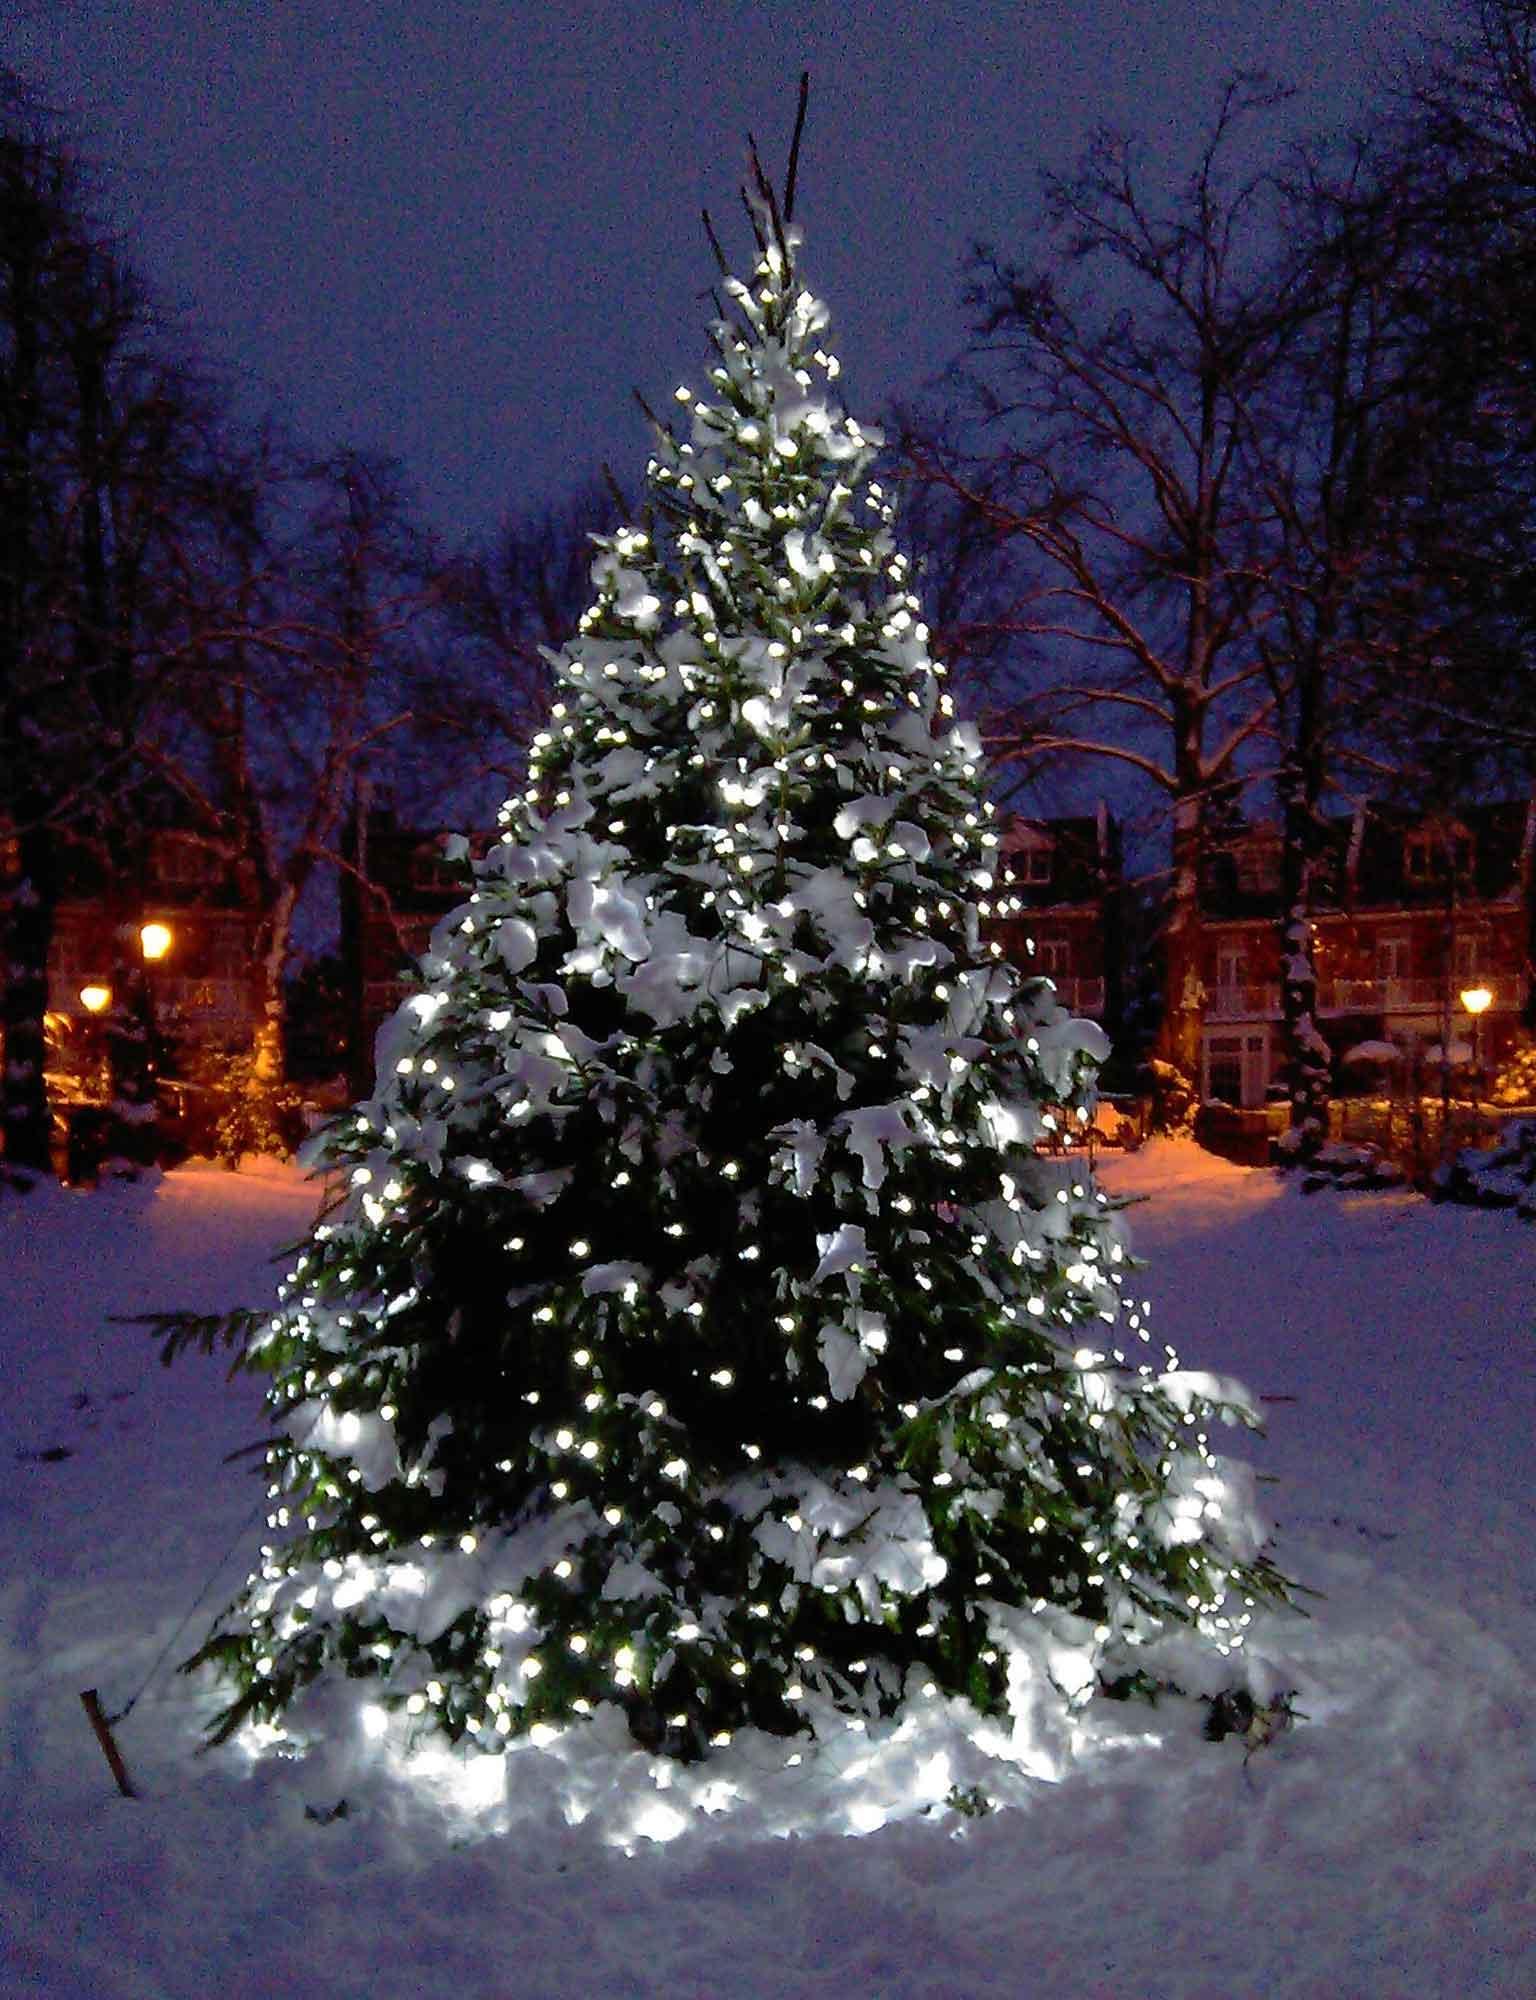 White Christmas Tree With Lights.Christmas Tree Light Ideas Lights4fun Co Uk